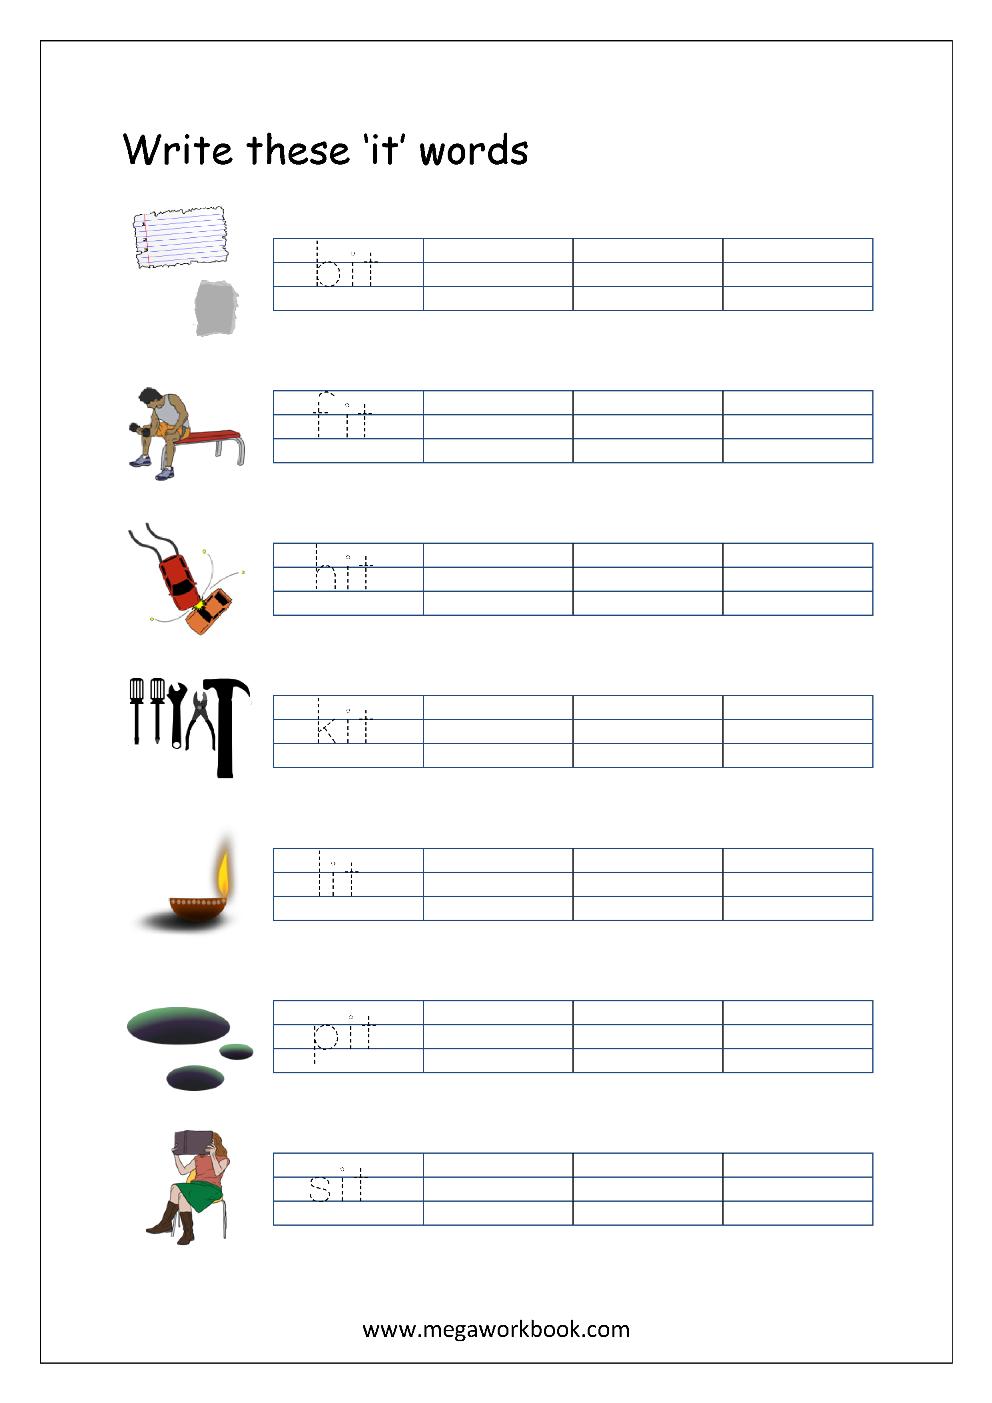 Free Printable Cvc Words Writing Worksheets For Kids